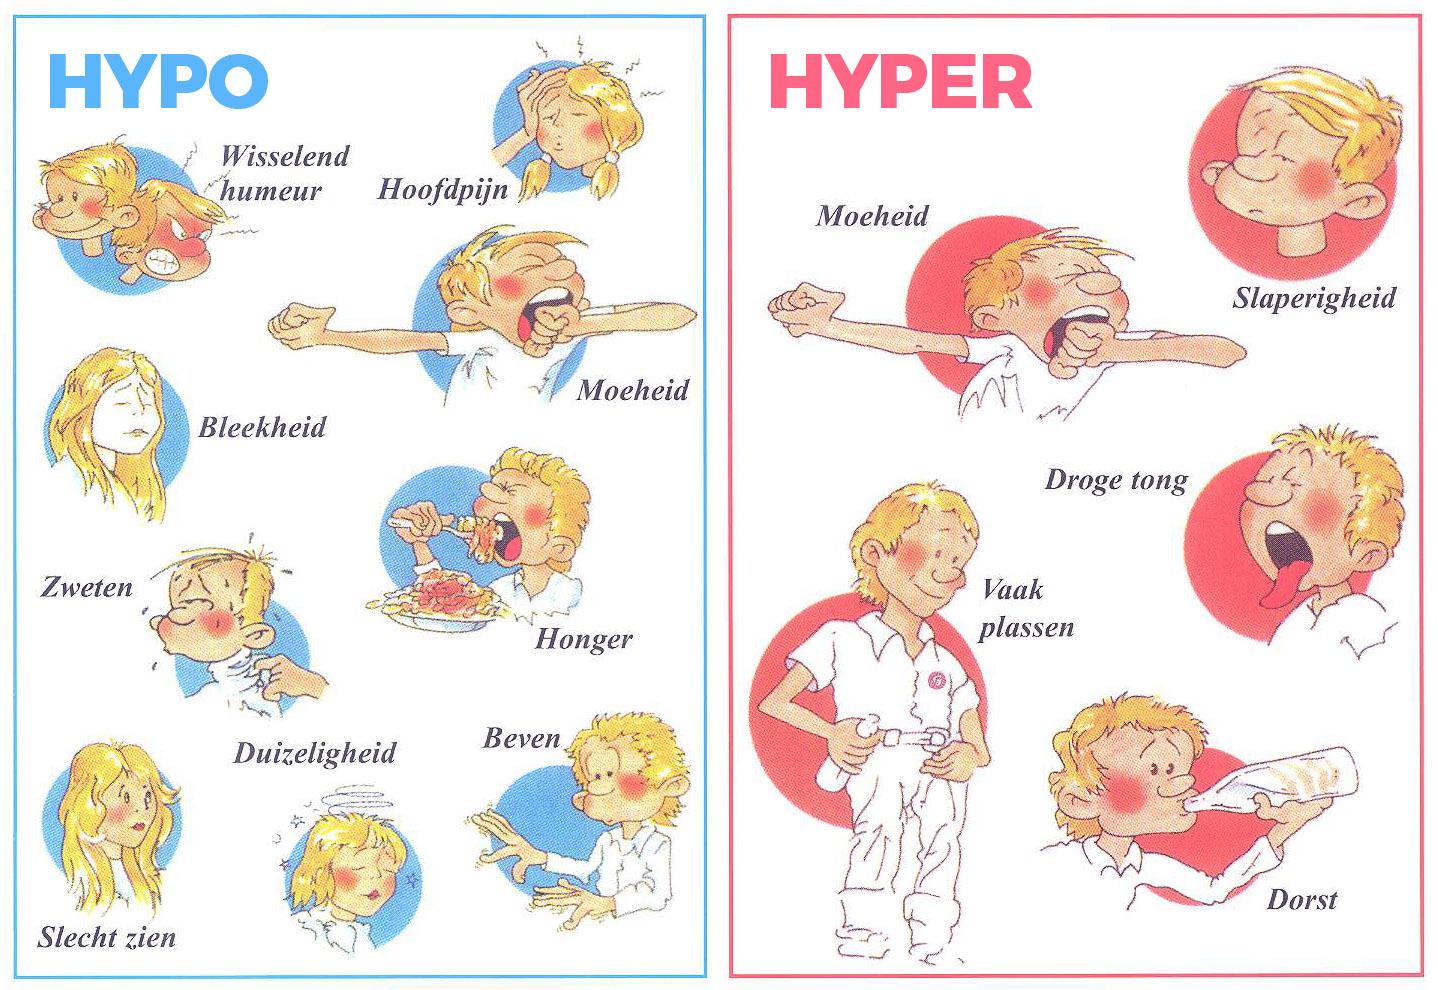 Hypo Hyper